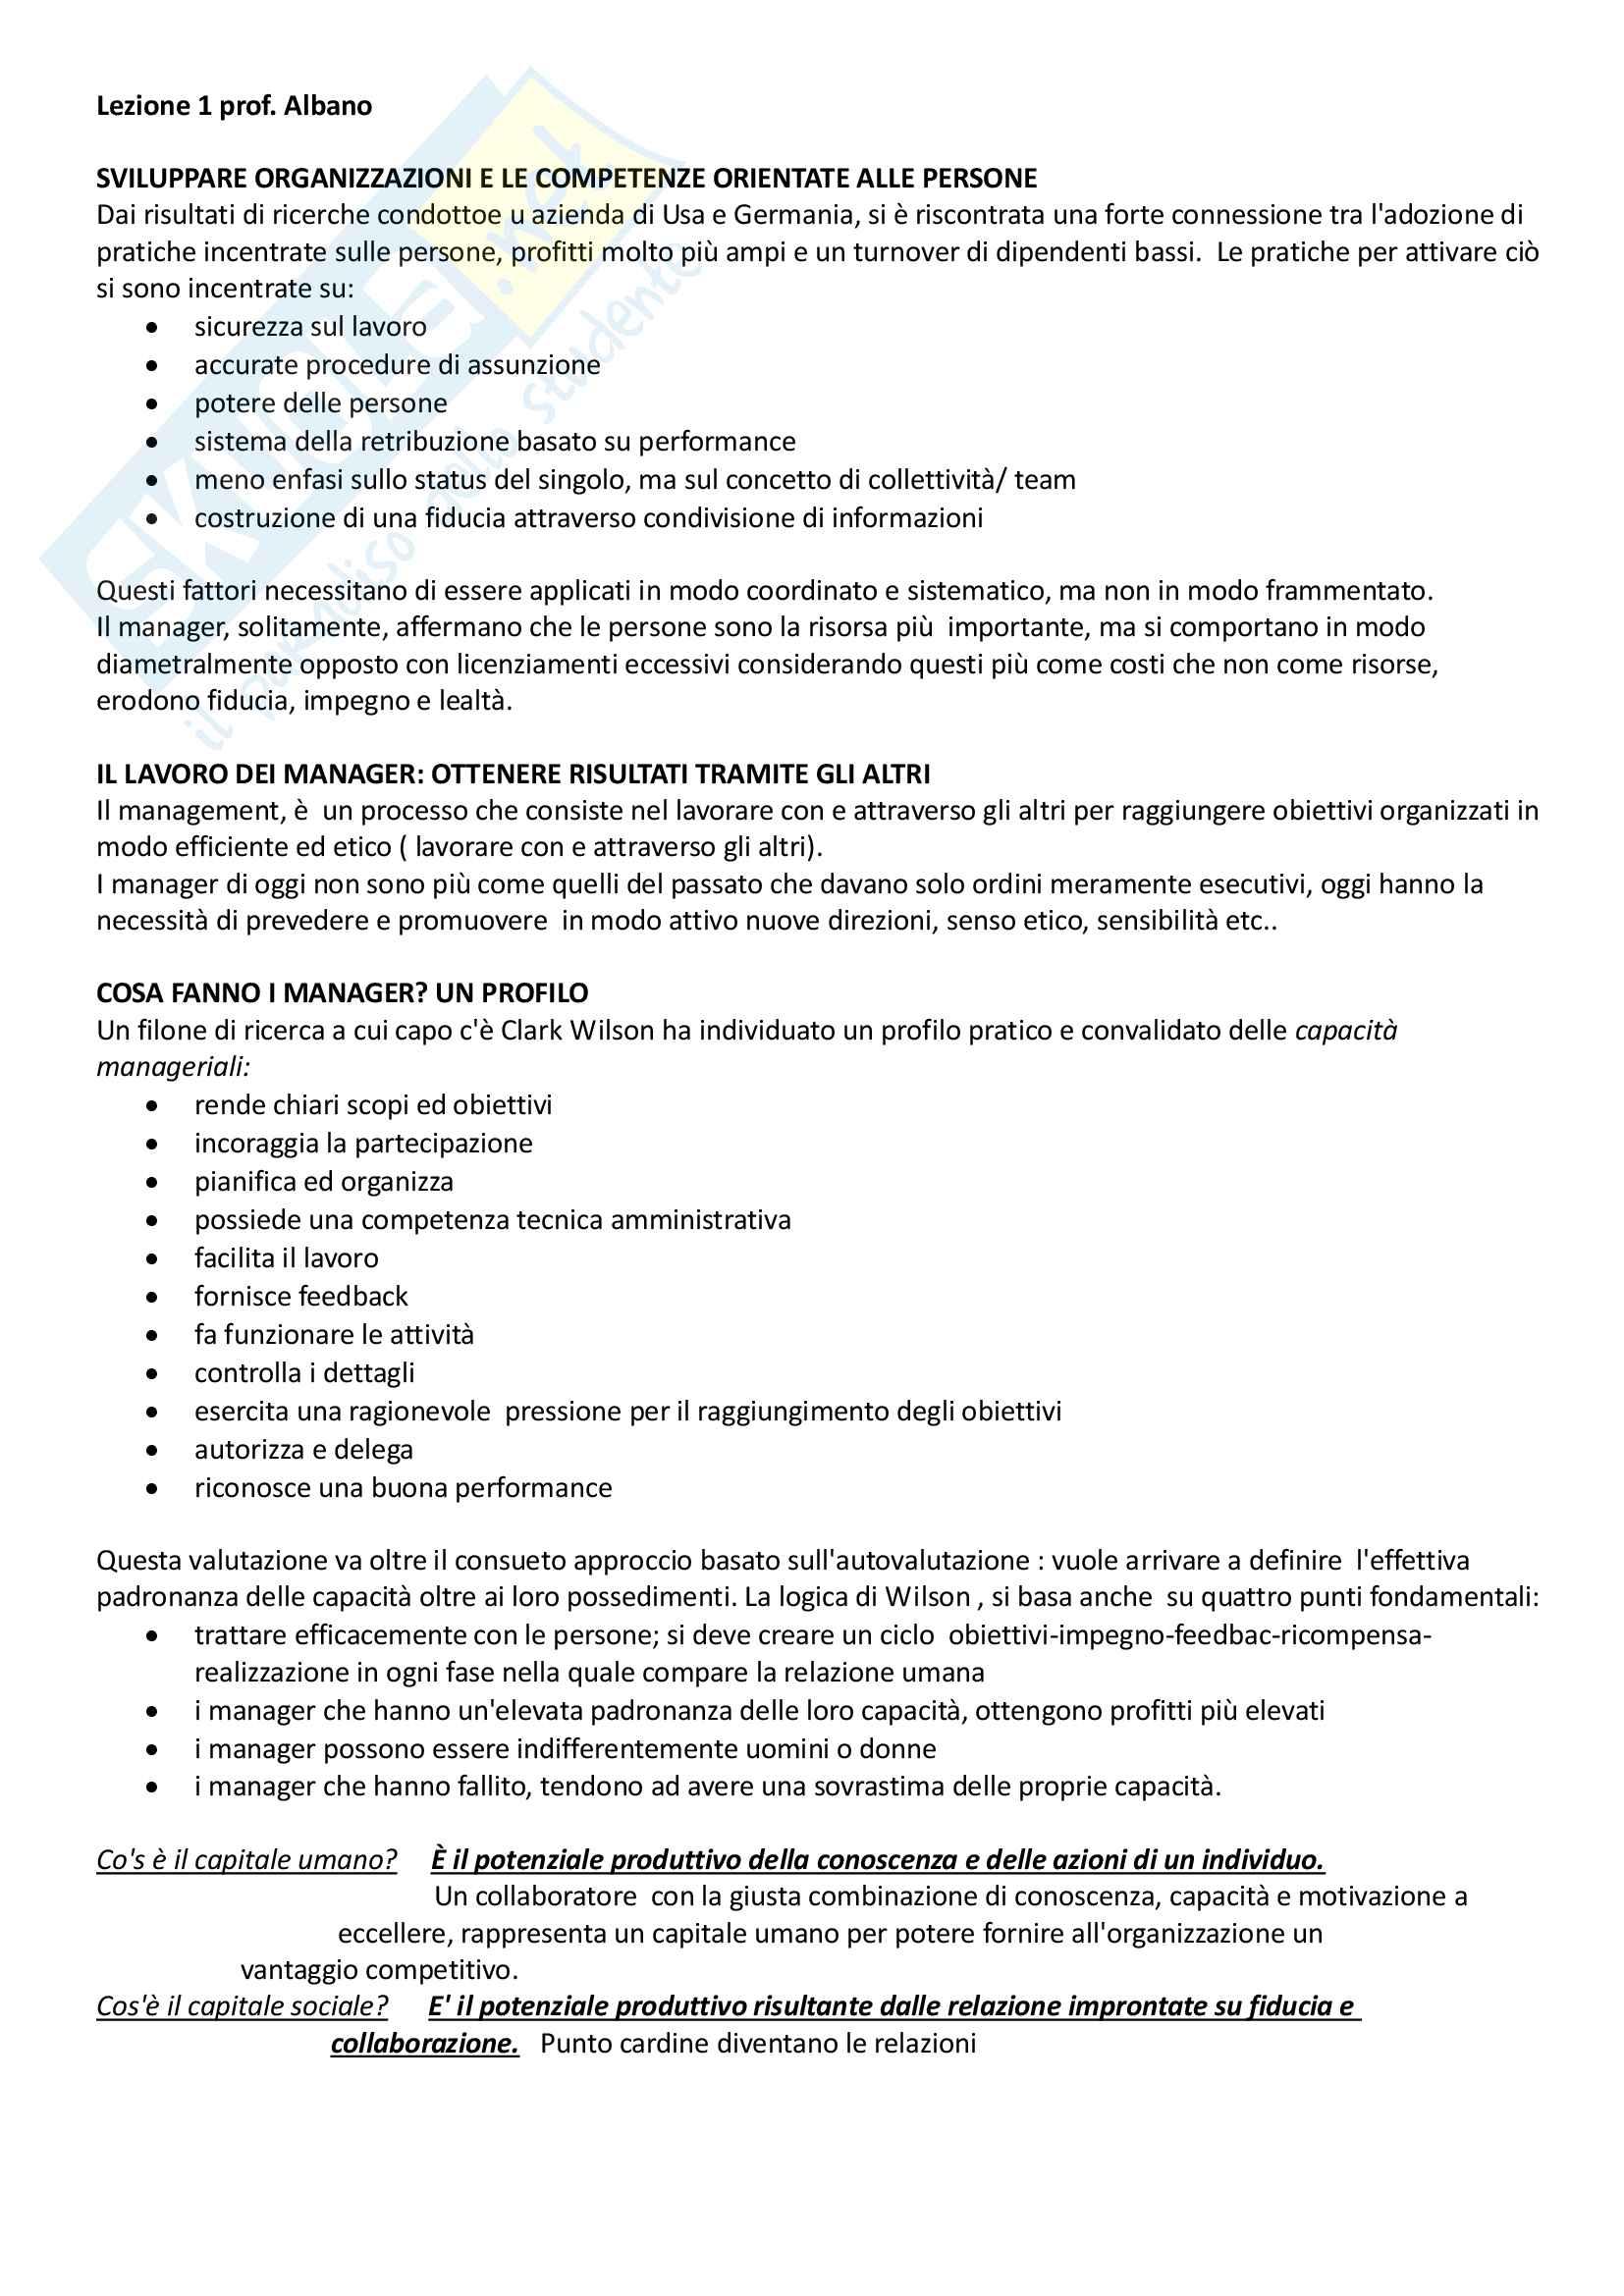 Gestione risorse umane (Albano)